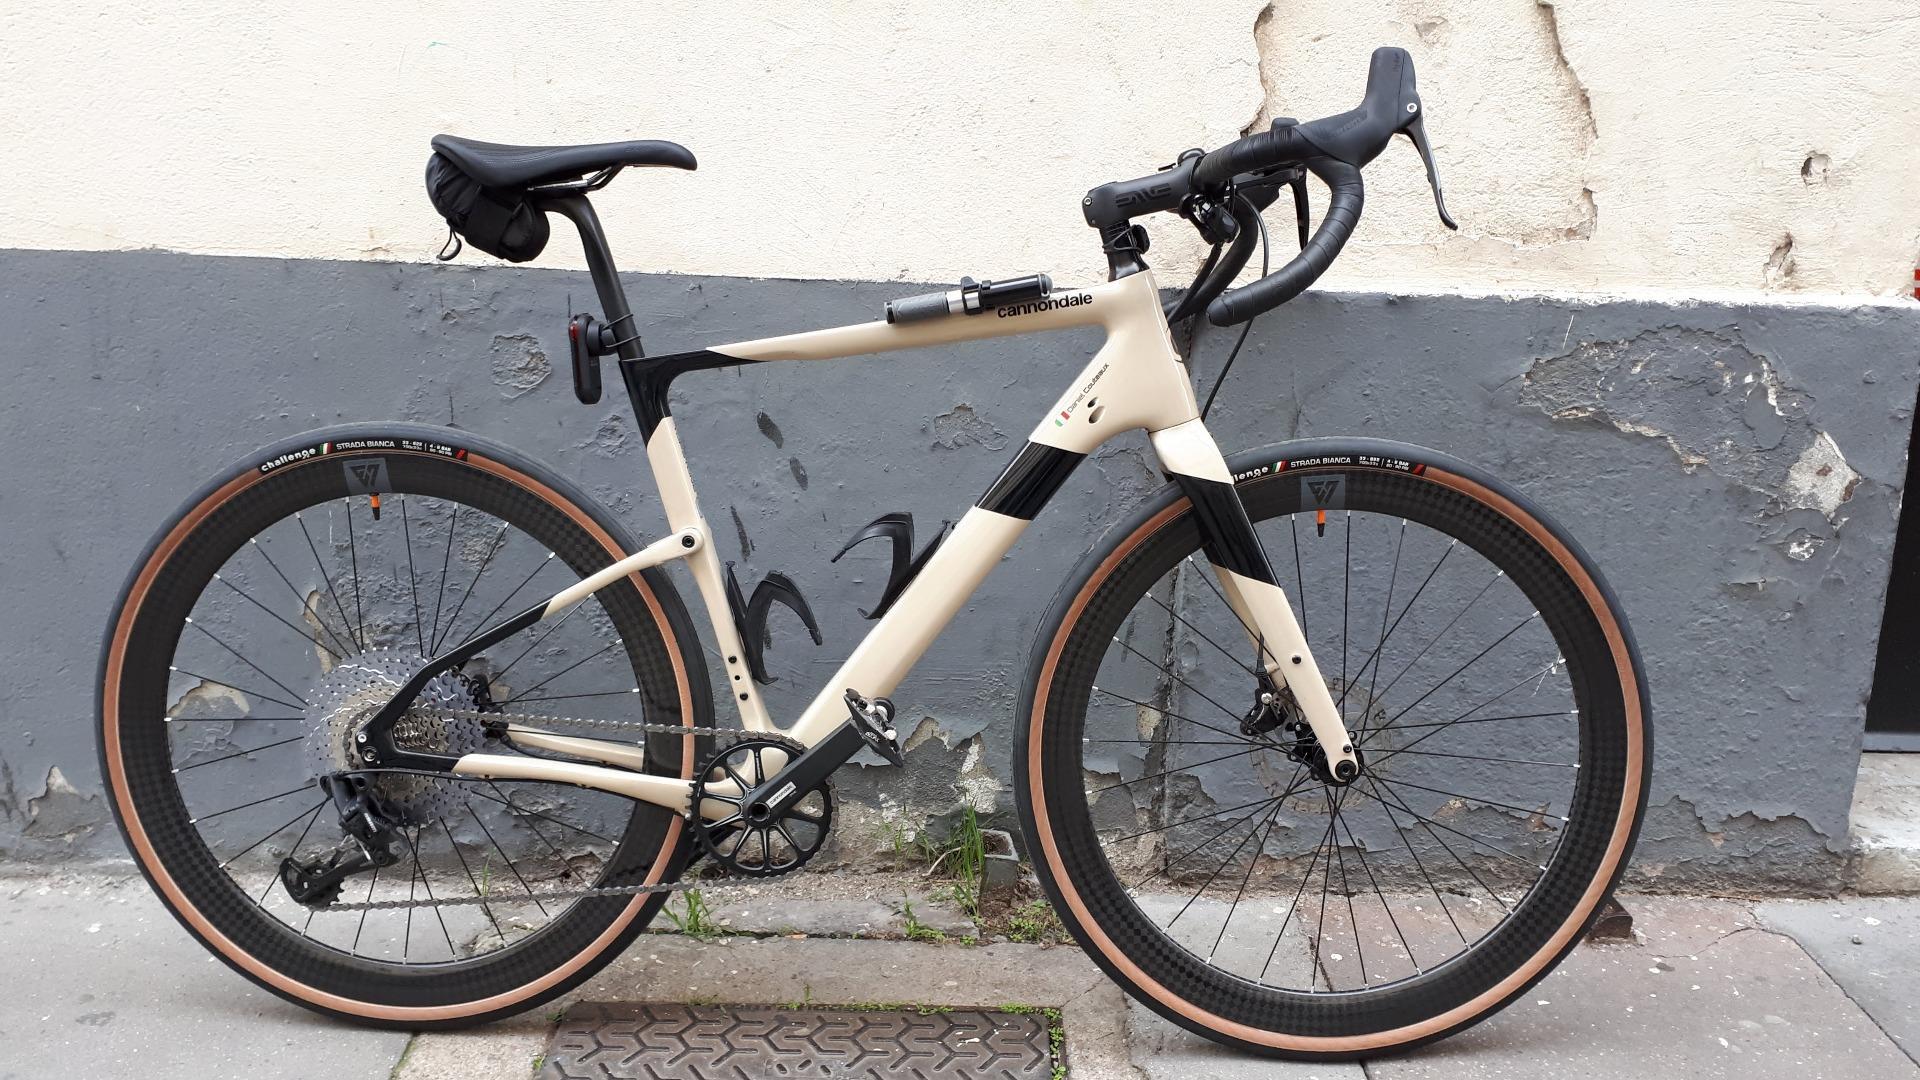 cannondale-road-bicycle-disc-brake-biege-black